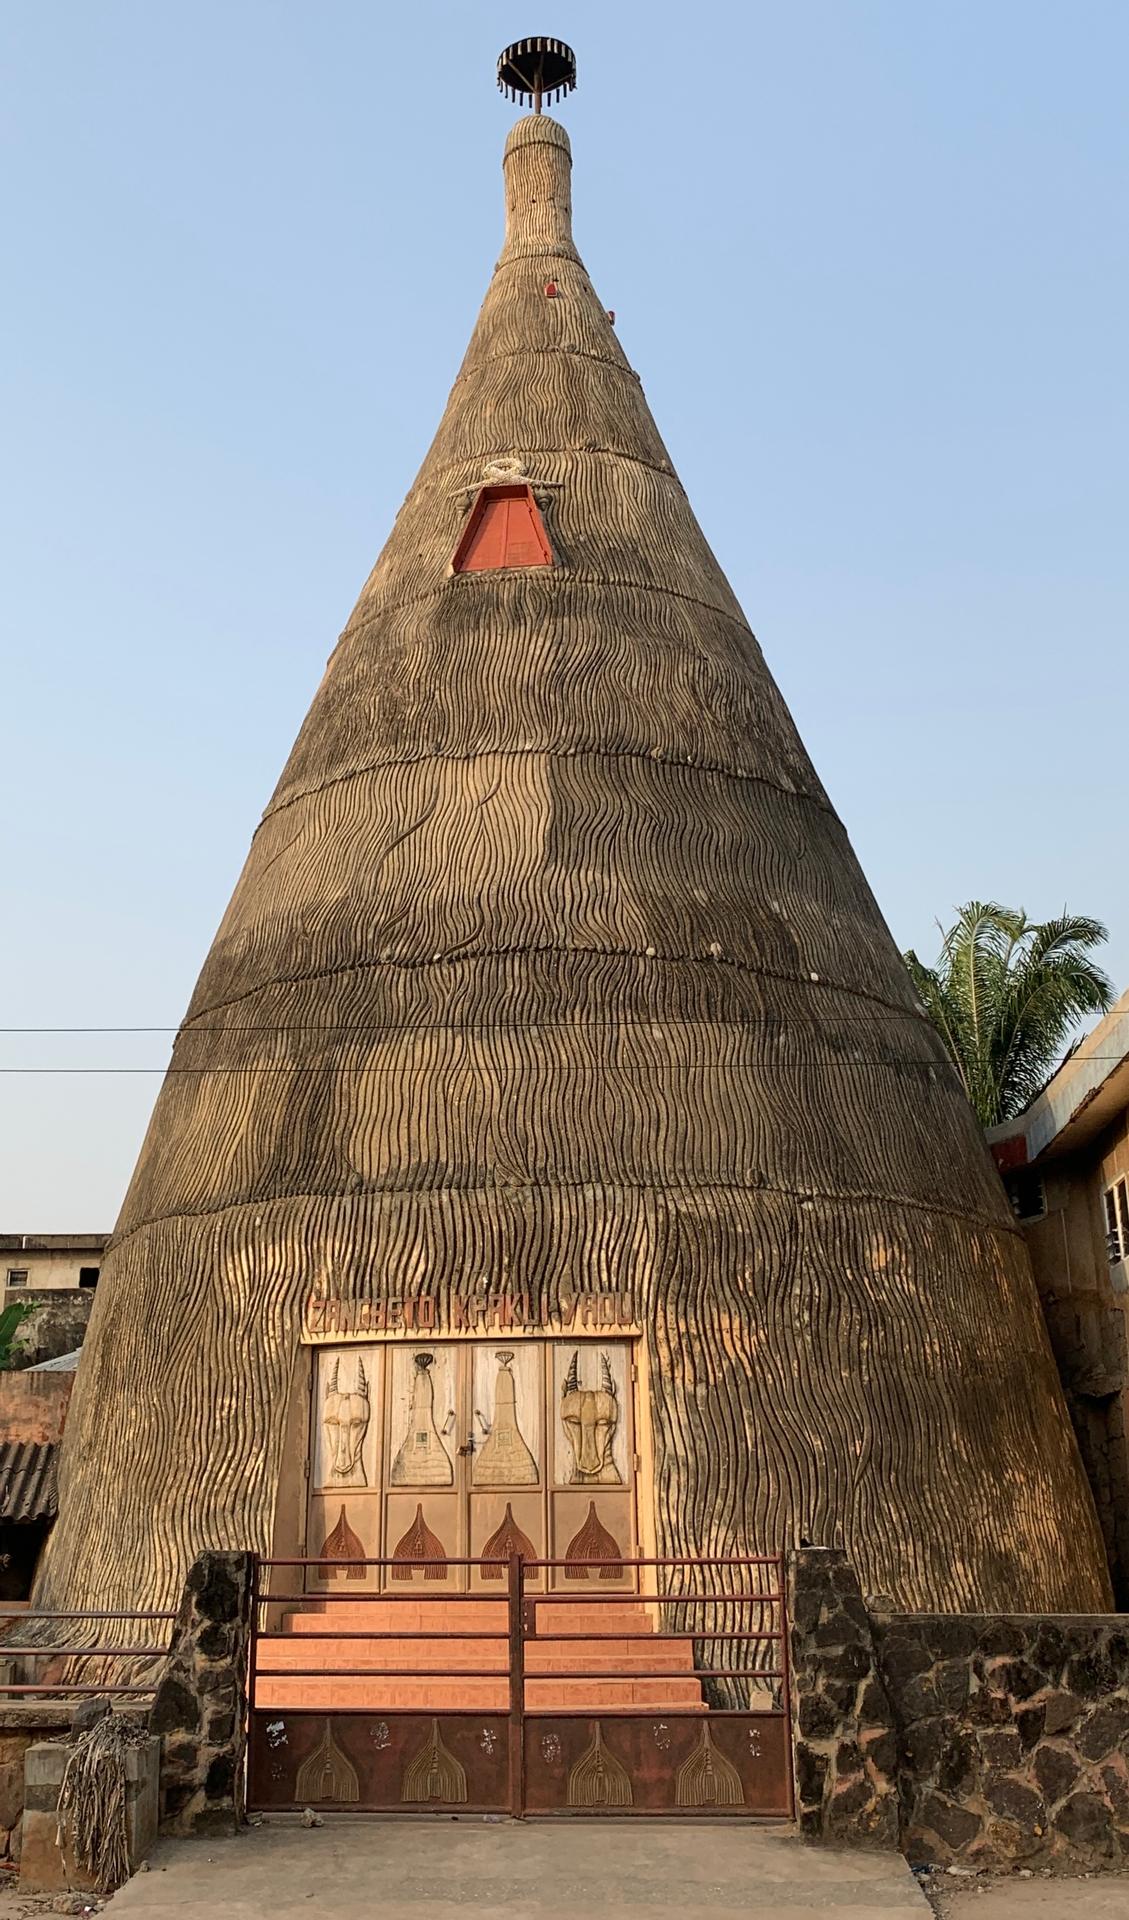 Africa, free, photo, zangbeto, religion, worship, faith, traditional, construction, building, architecture, vaudou temple, voodoo, vodoun, divinity, sacred place